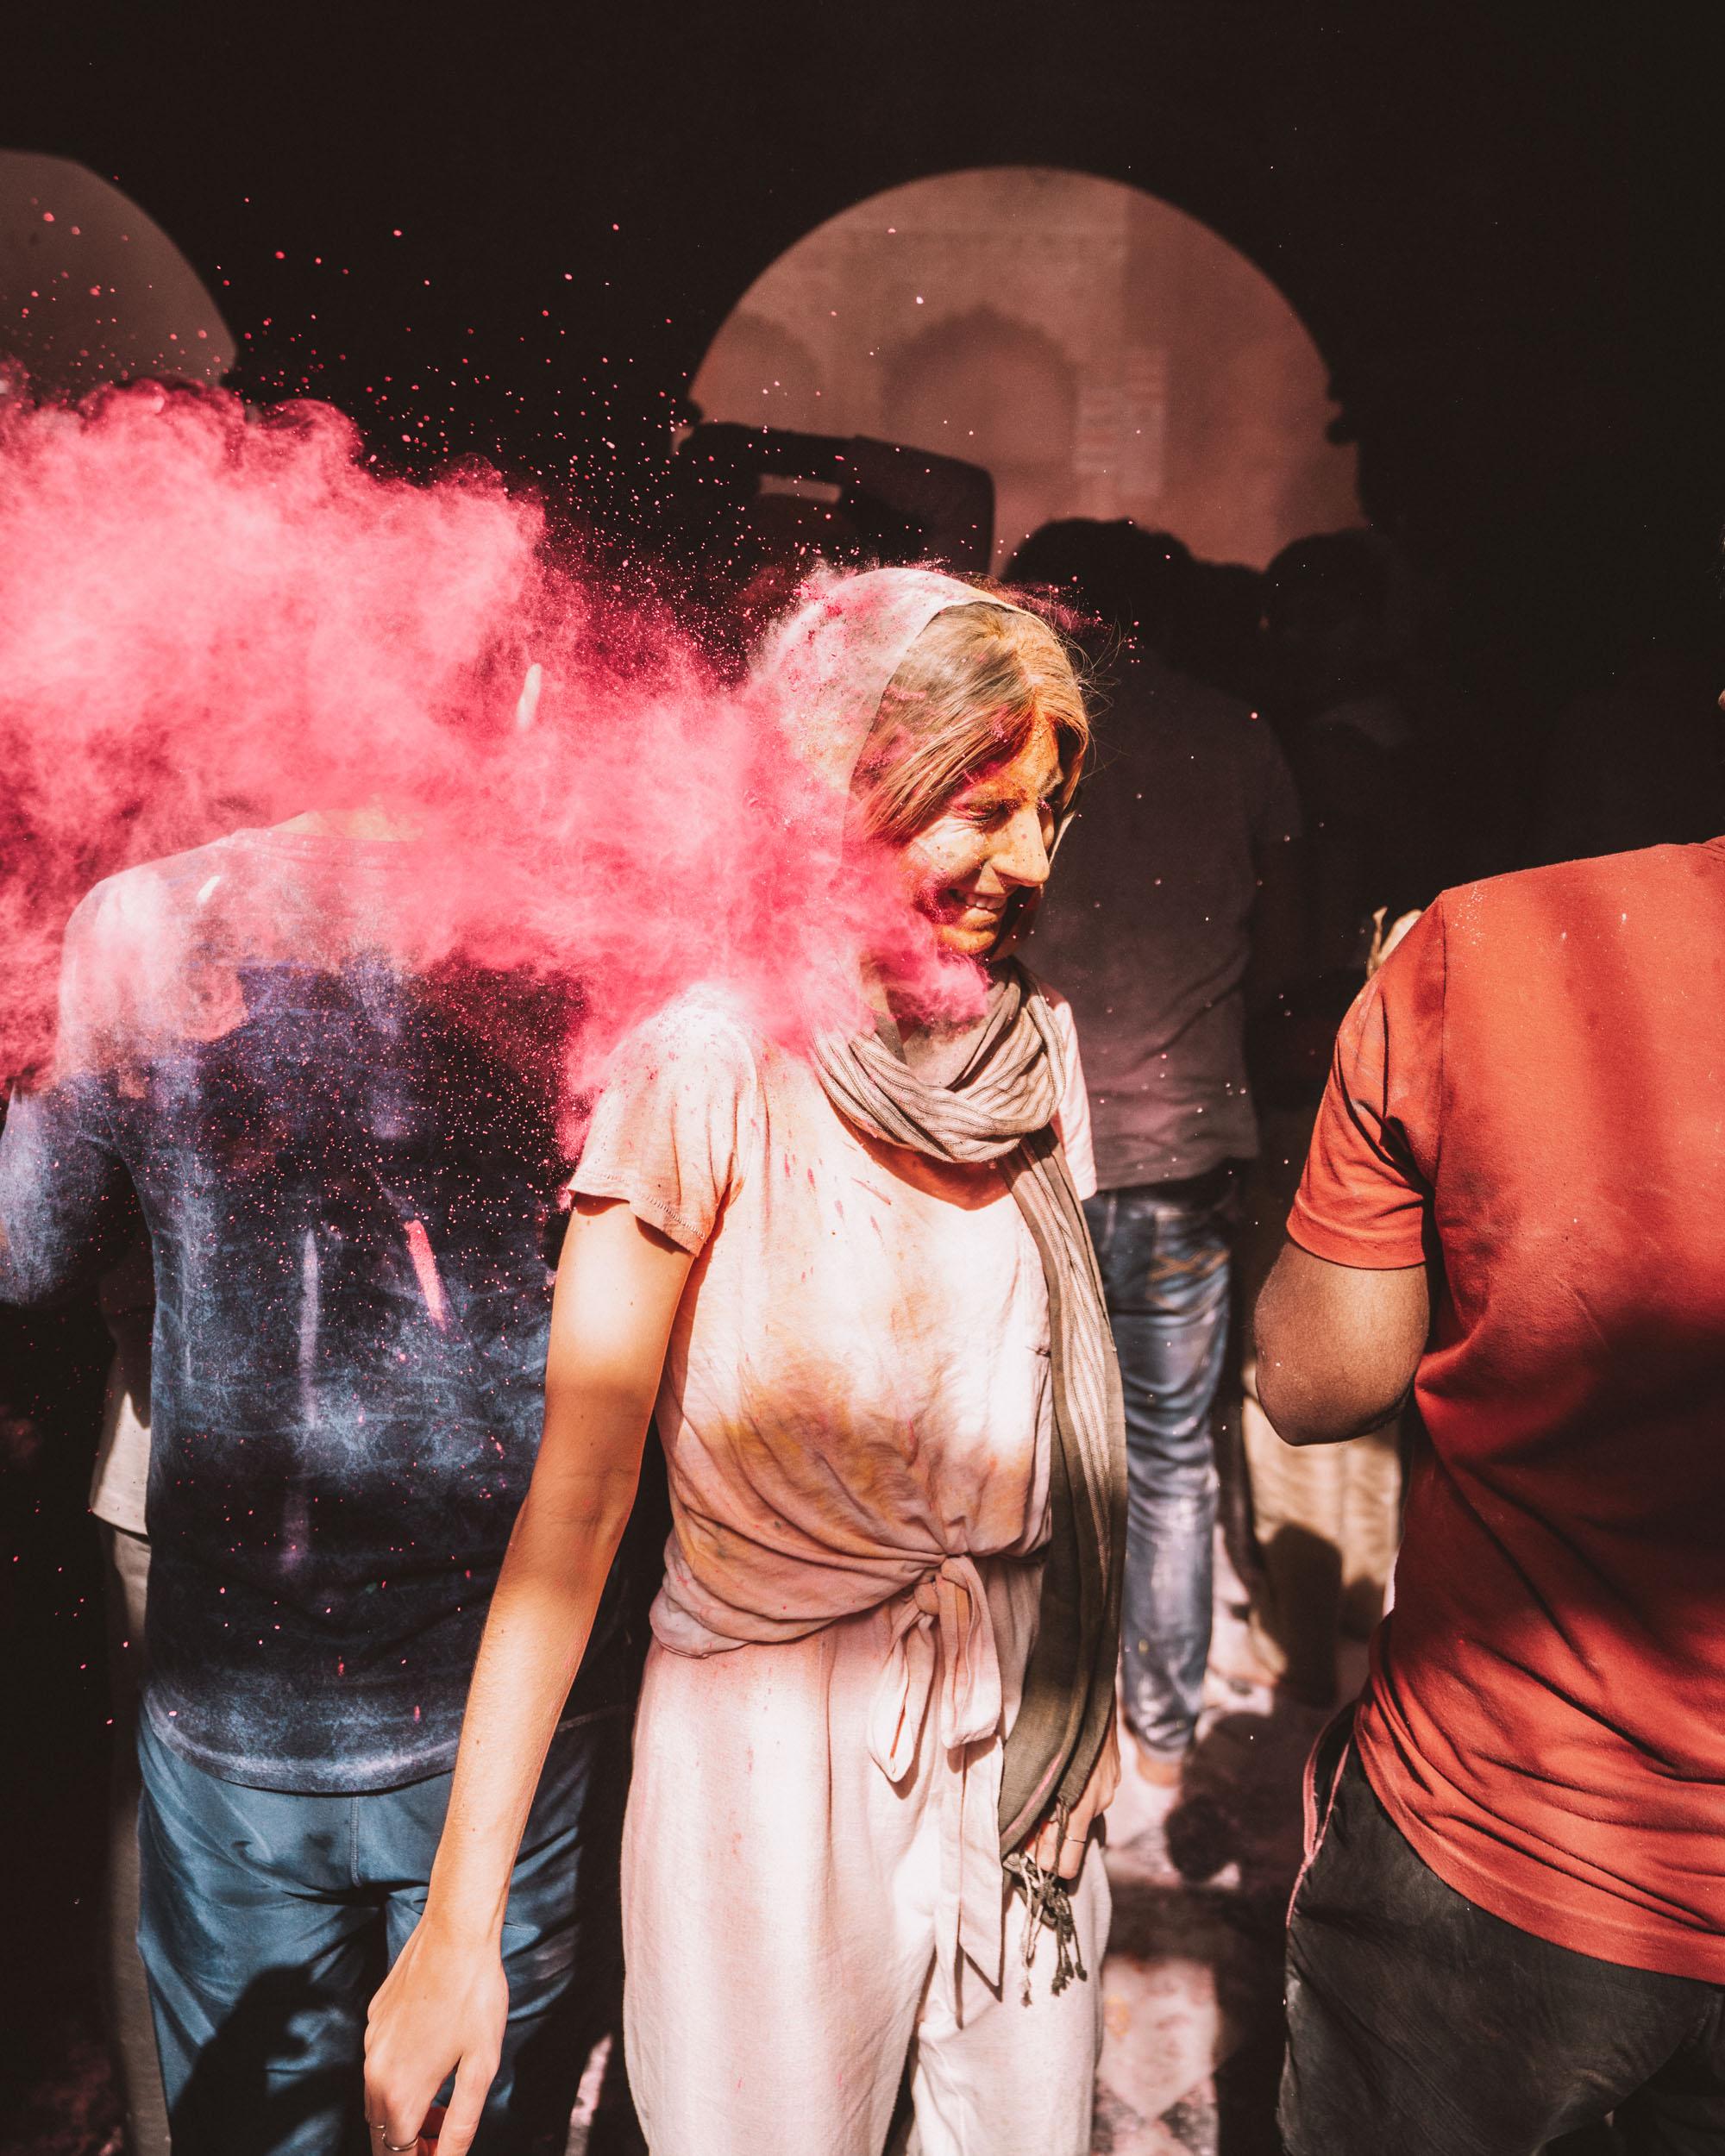 Pink powder being thrown at woman during Banke Bihari Holi Festival in Vrindavan, India via @finduslost